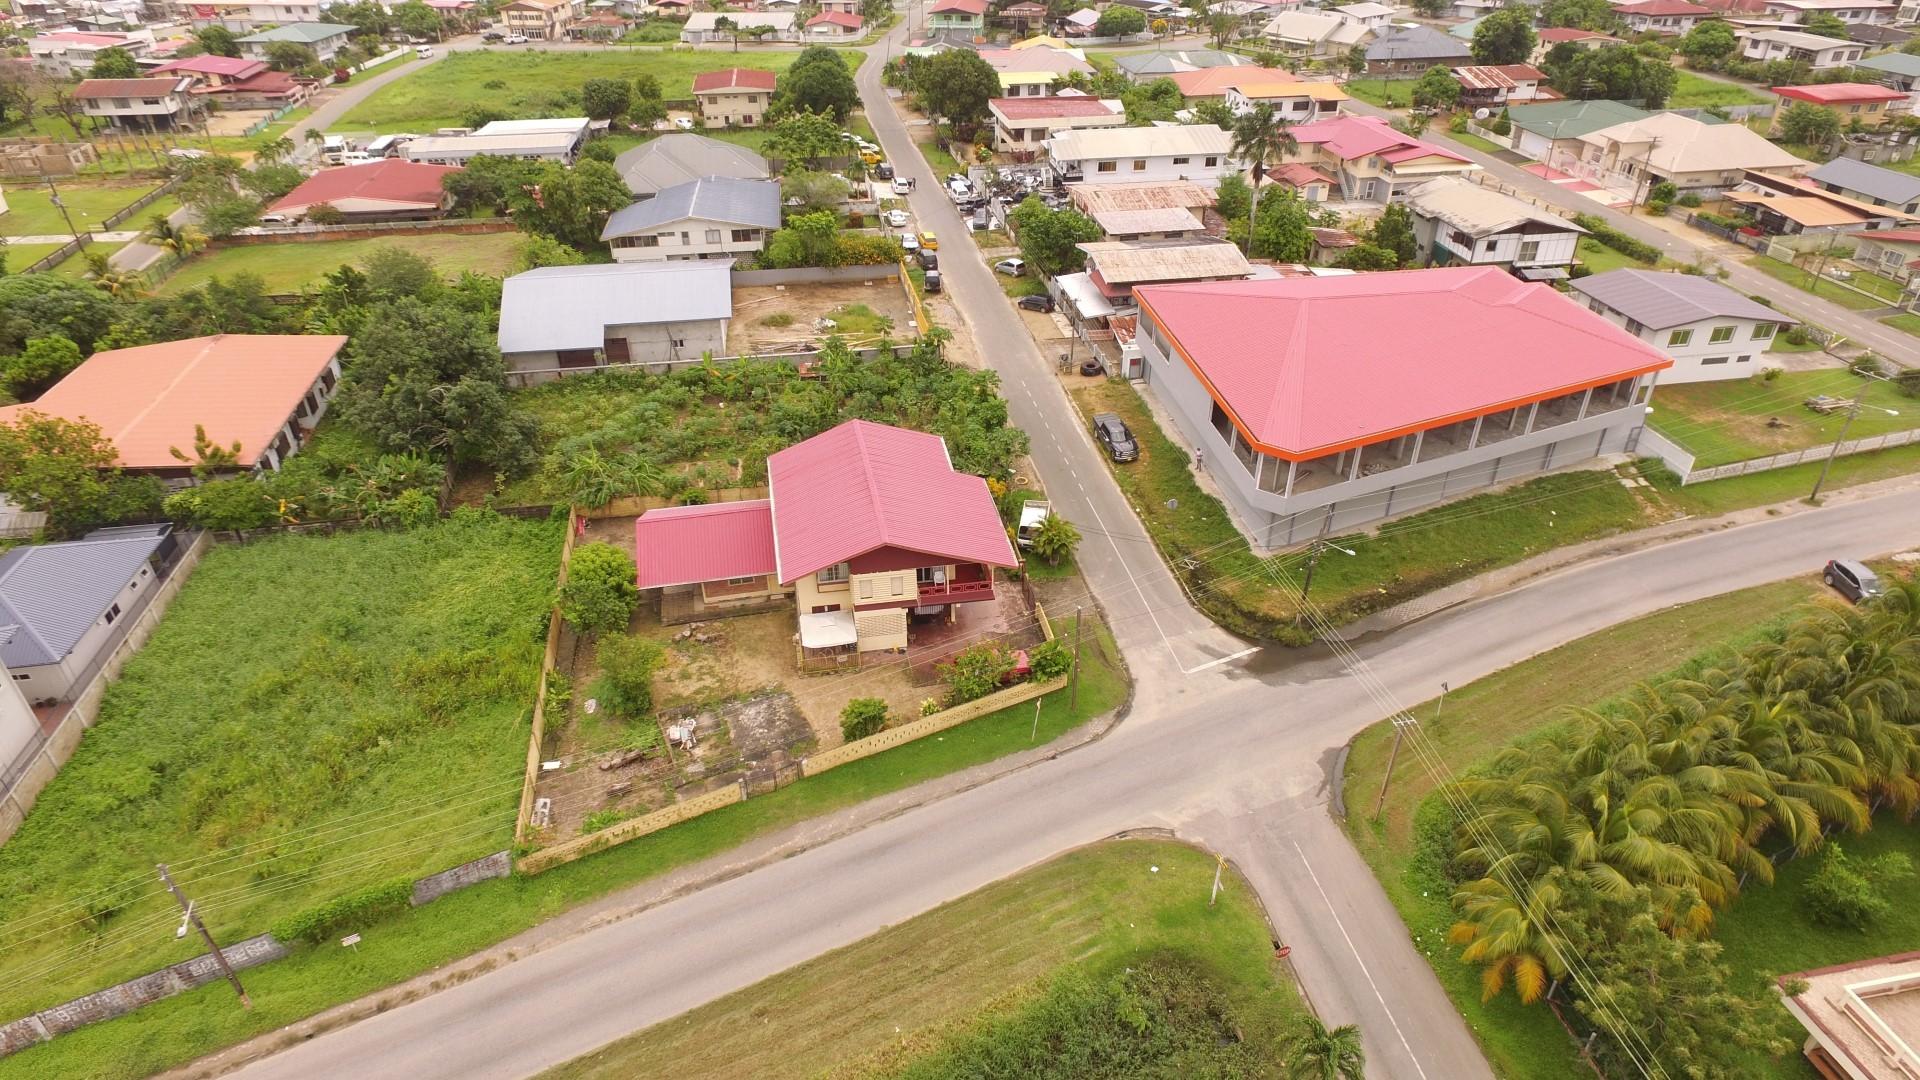 Henkielaan-32-Koopwoning-Terzol-Vastgoed-Paramaribo-Suriname-02